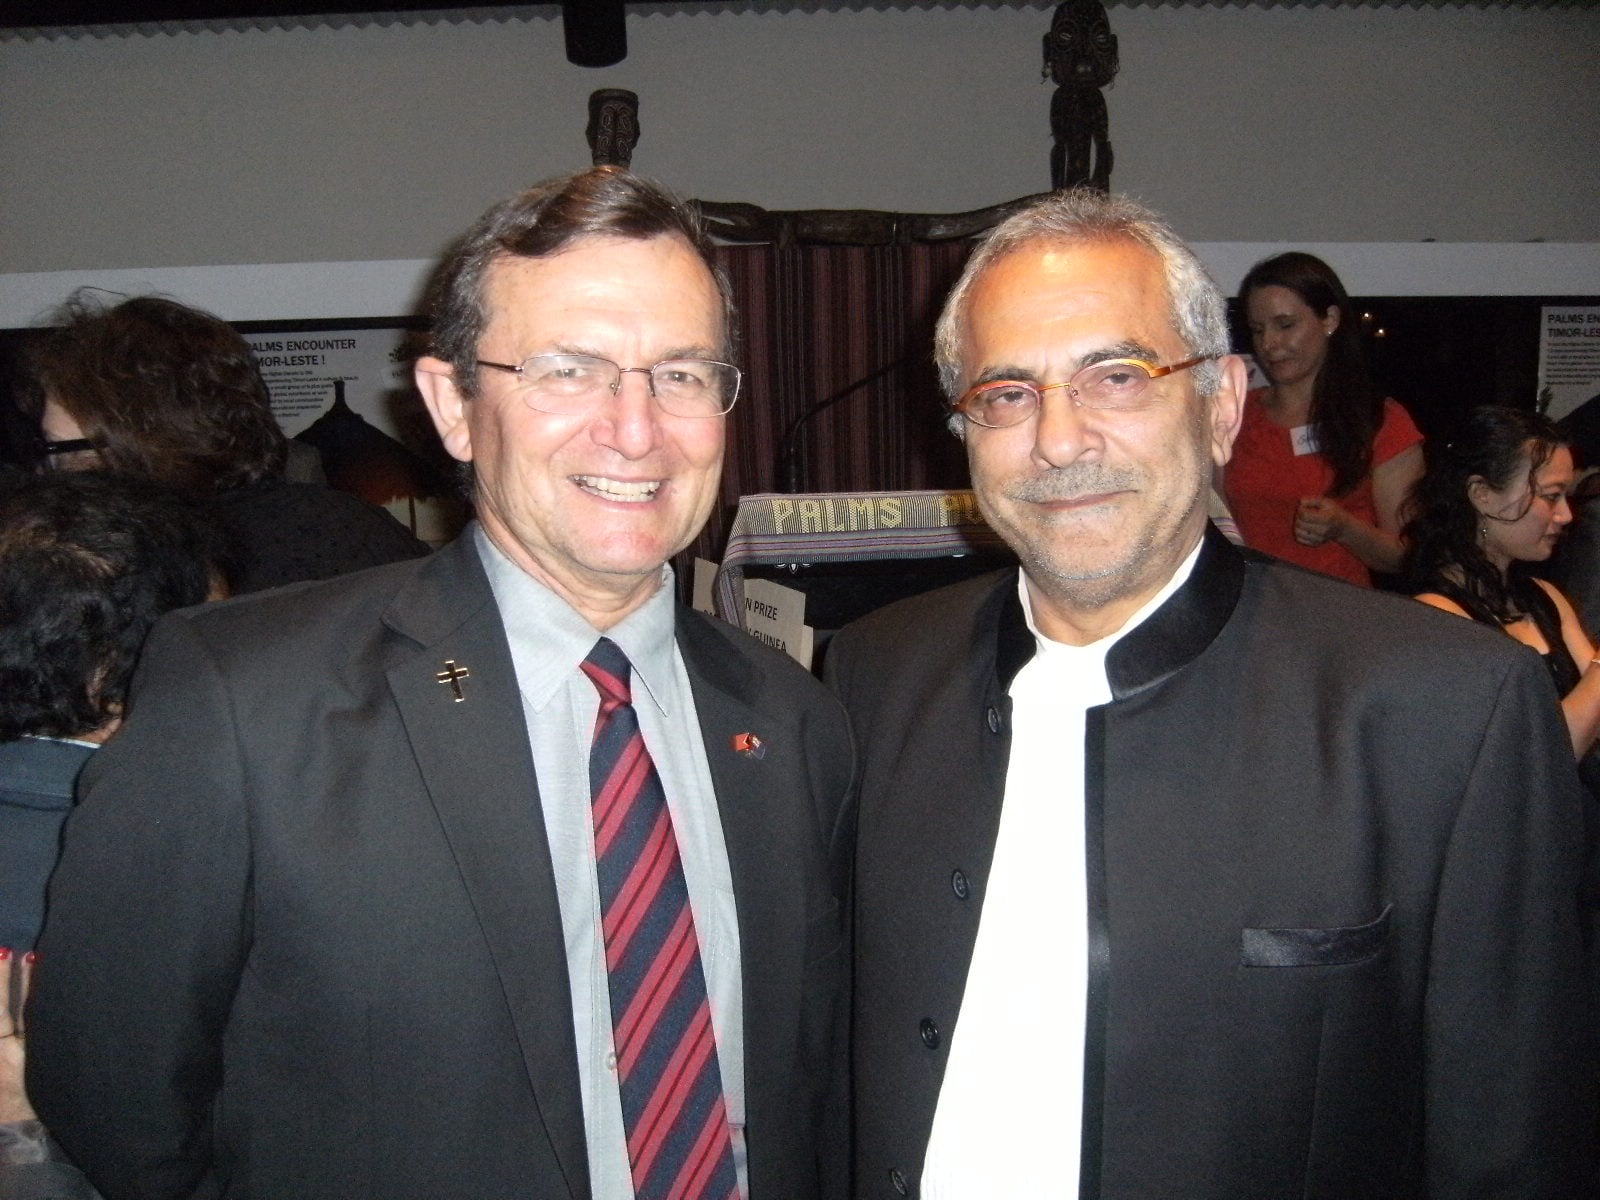 Gary with Former East Timor President Jose Ramos Horta